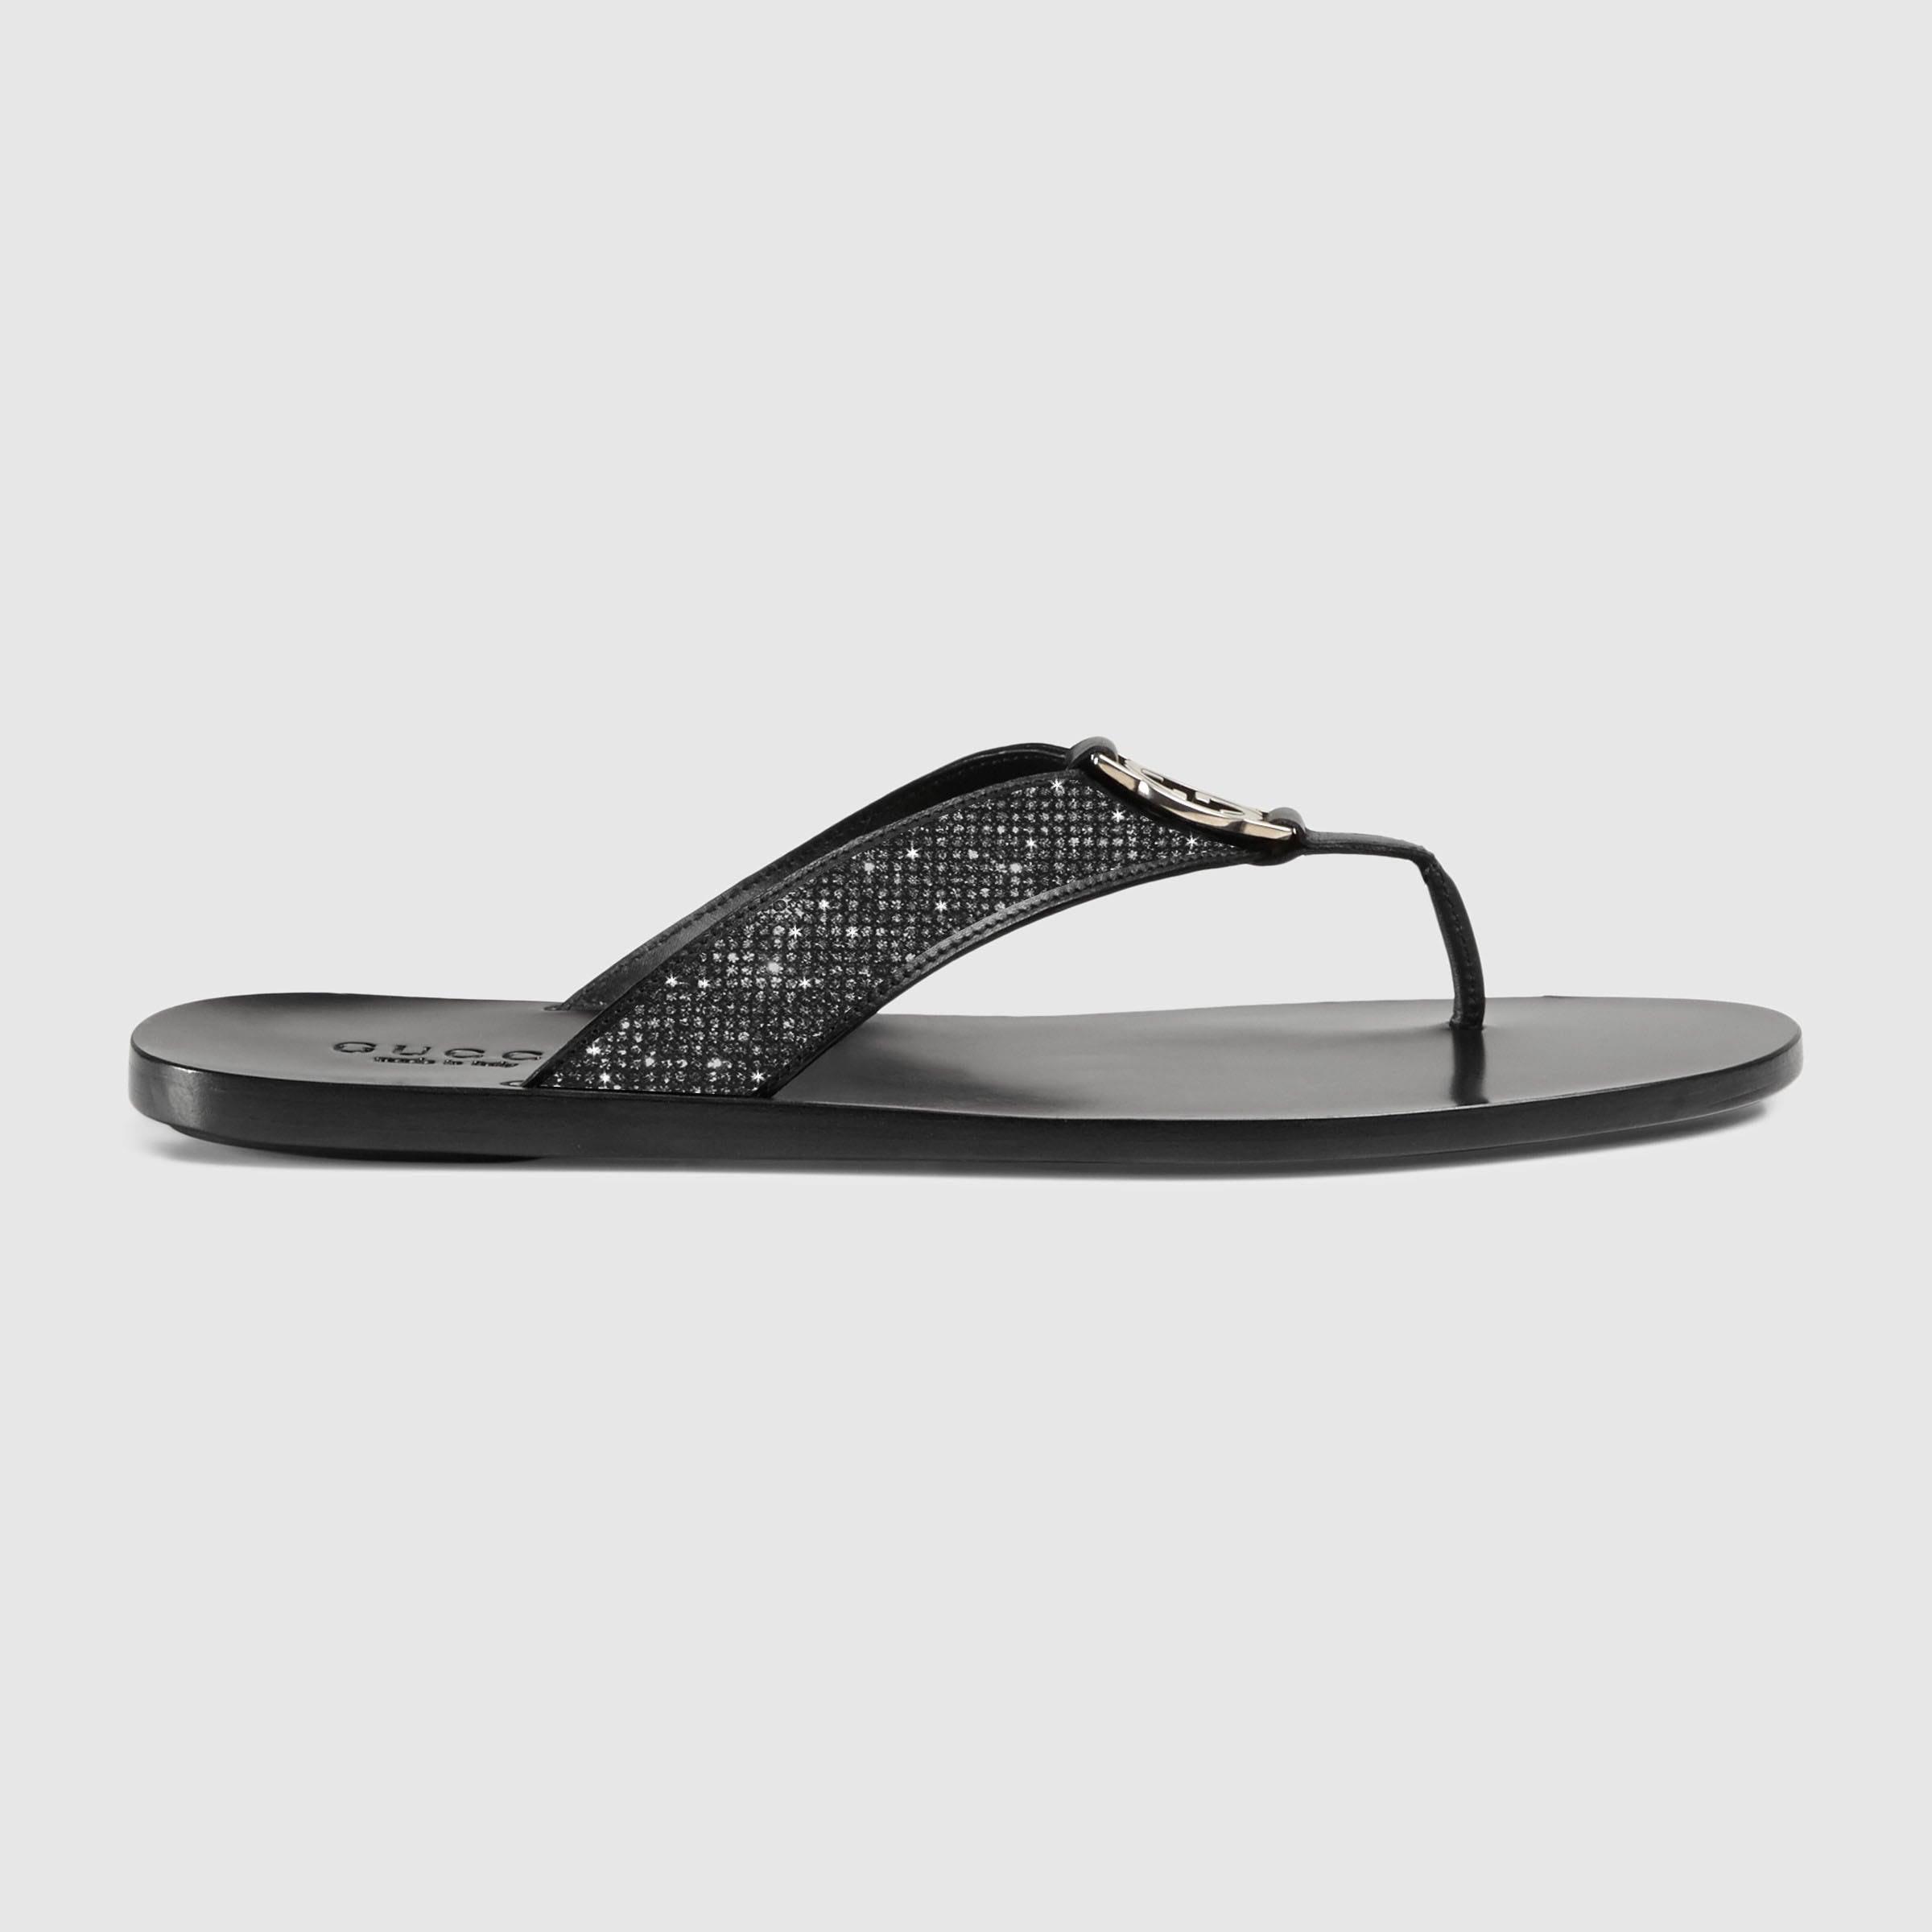 huge selection of d2808 e38c1 Gucci Leather thong sandal Swarovski Gucci slides Gucci   Etsy